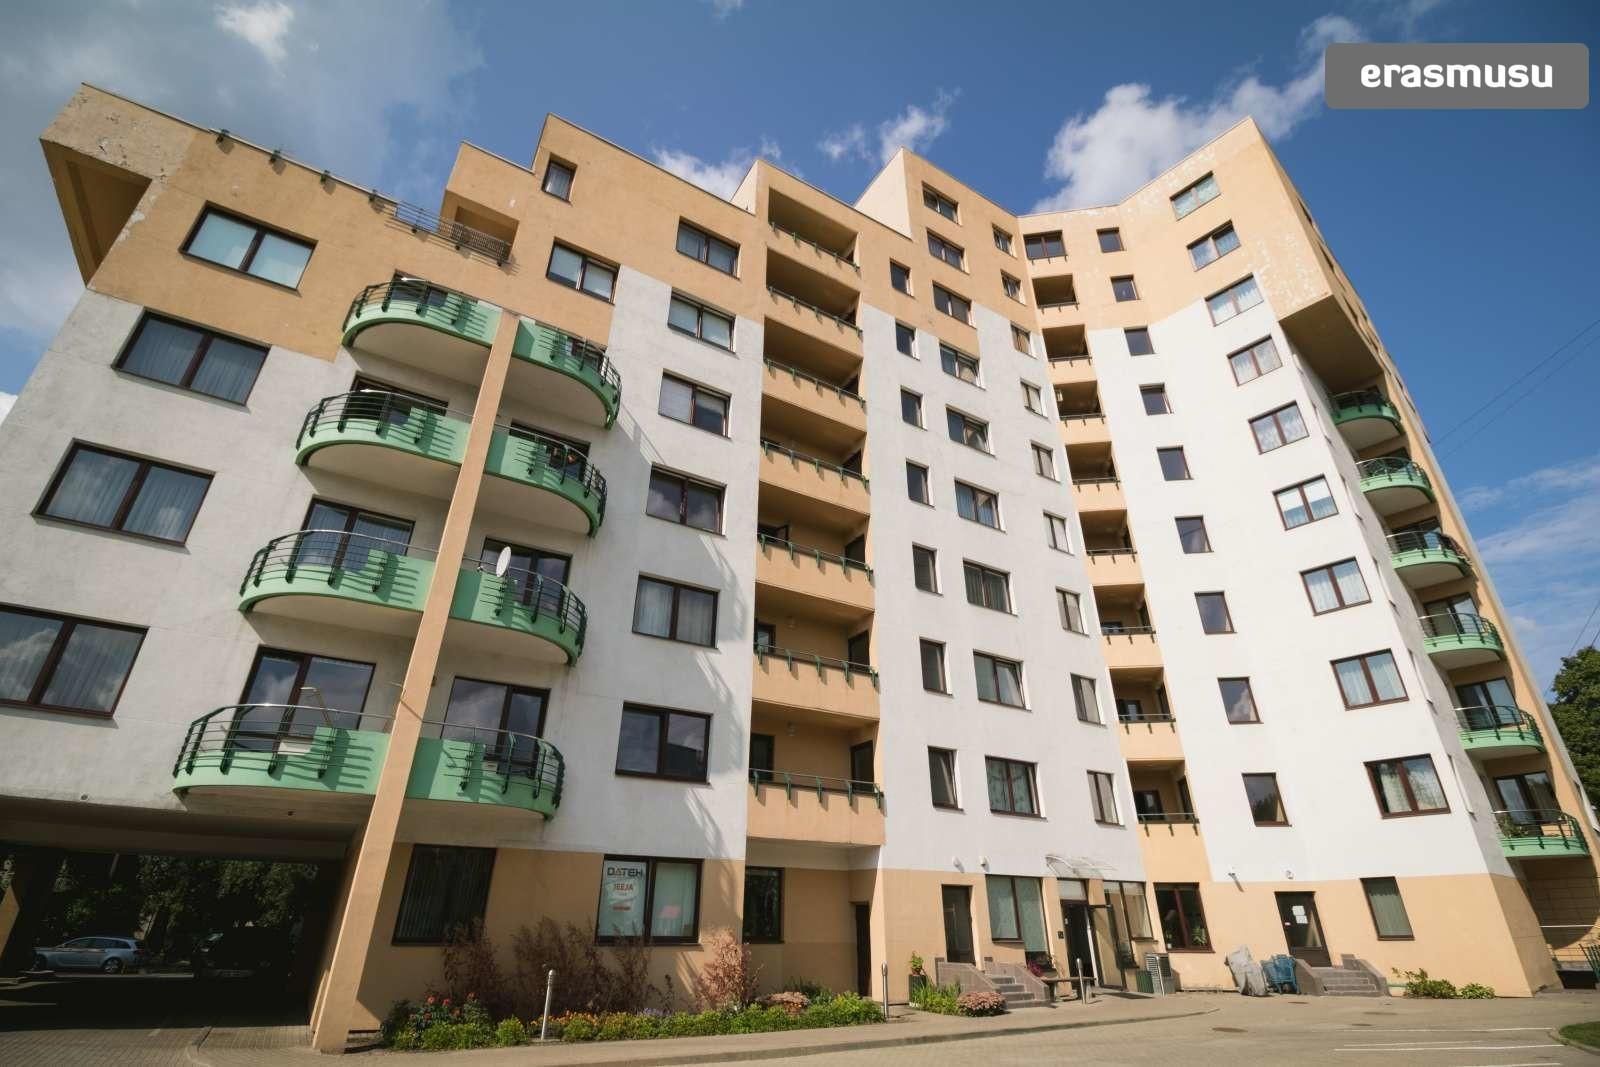 stylish-1-bedroom-apartment-balcony-rent-zasulauks-c822d604faa02